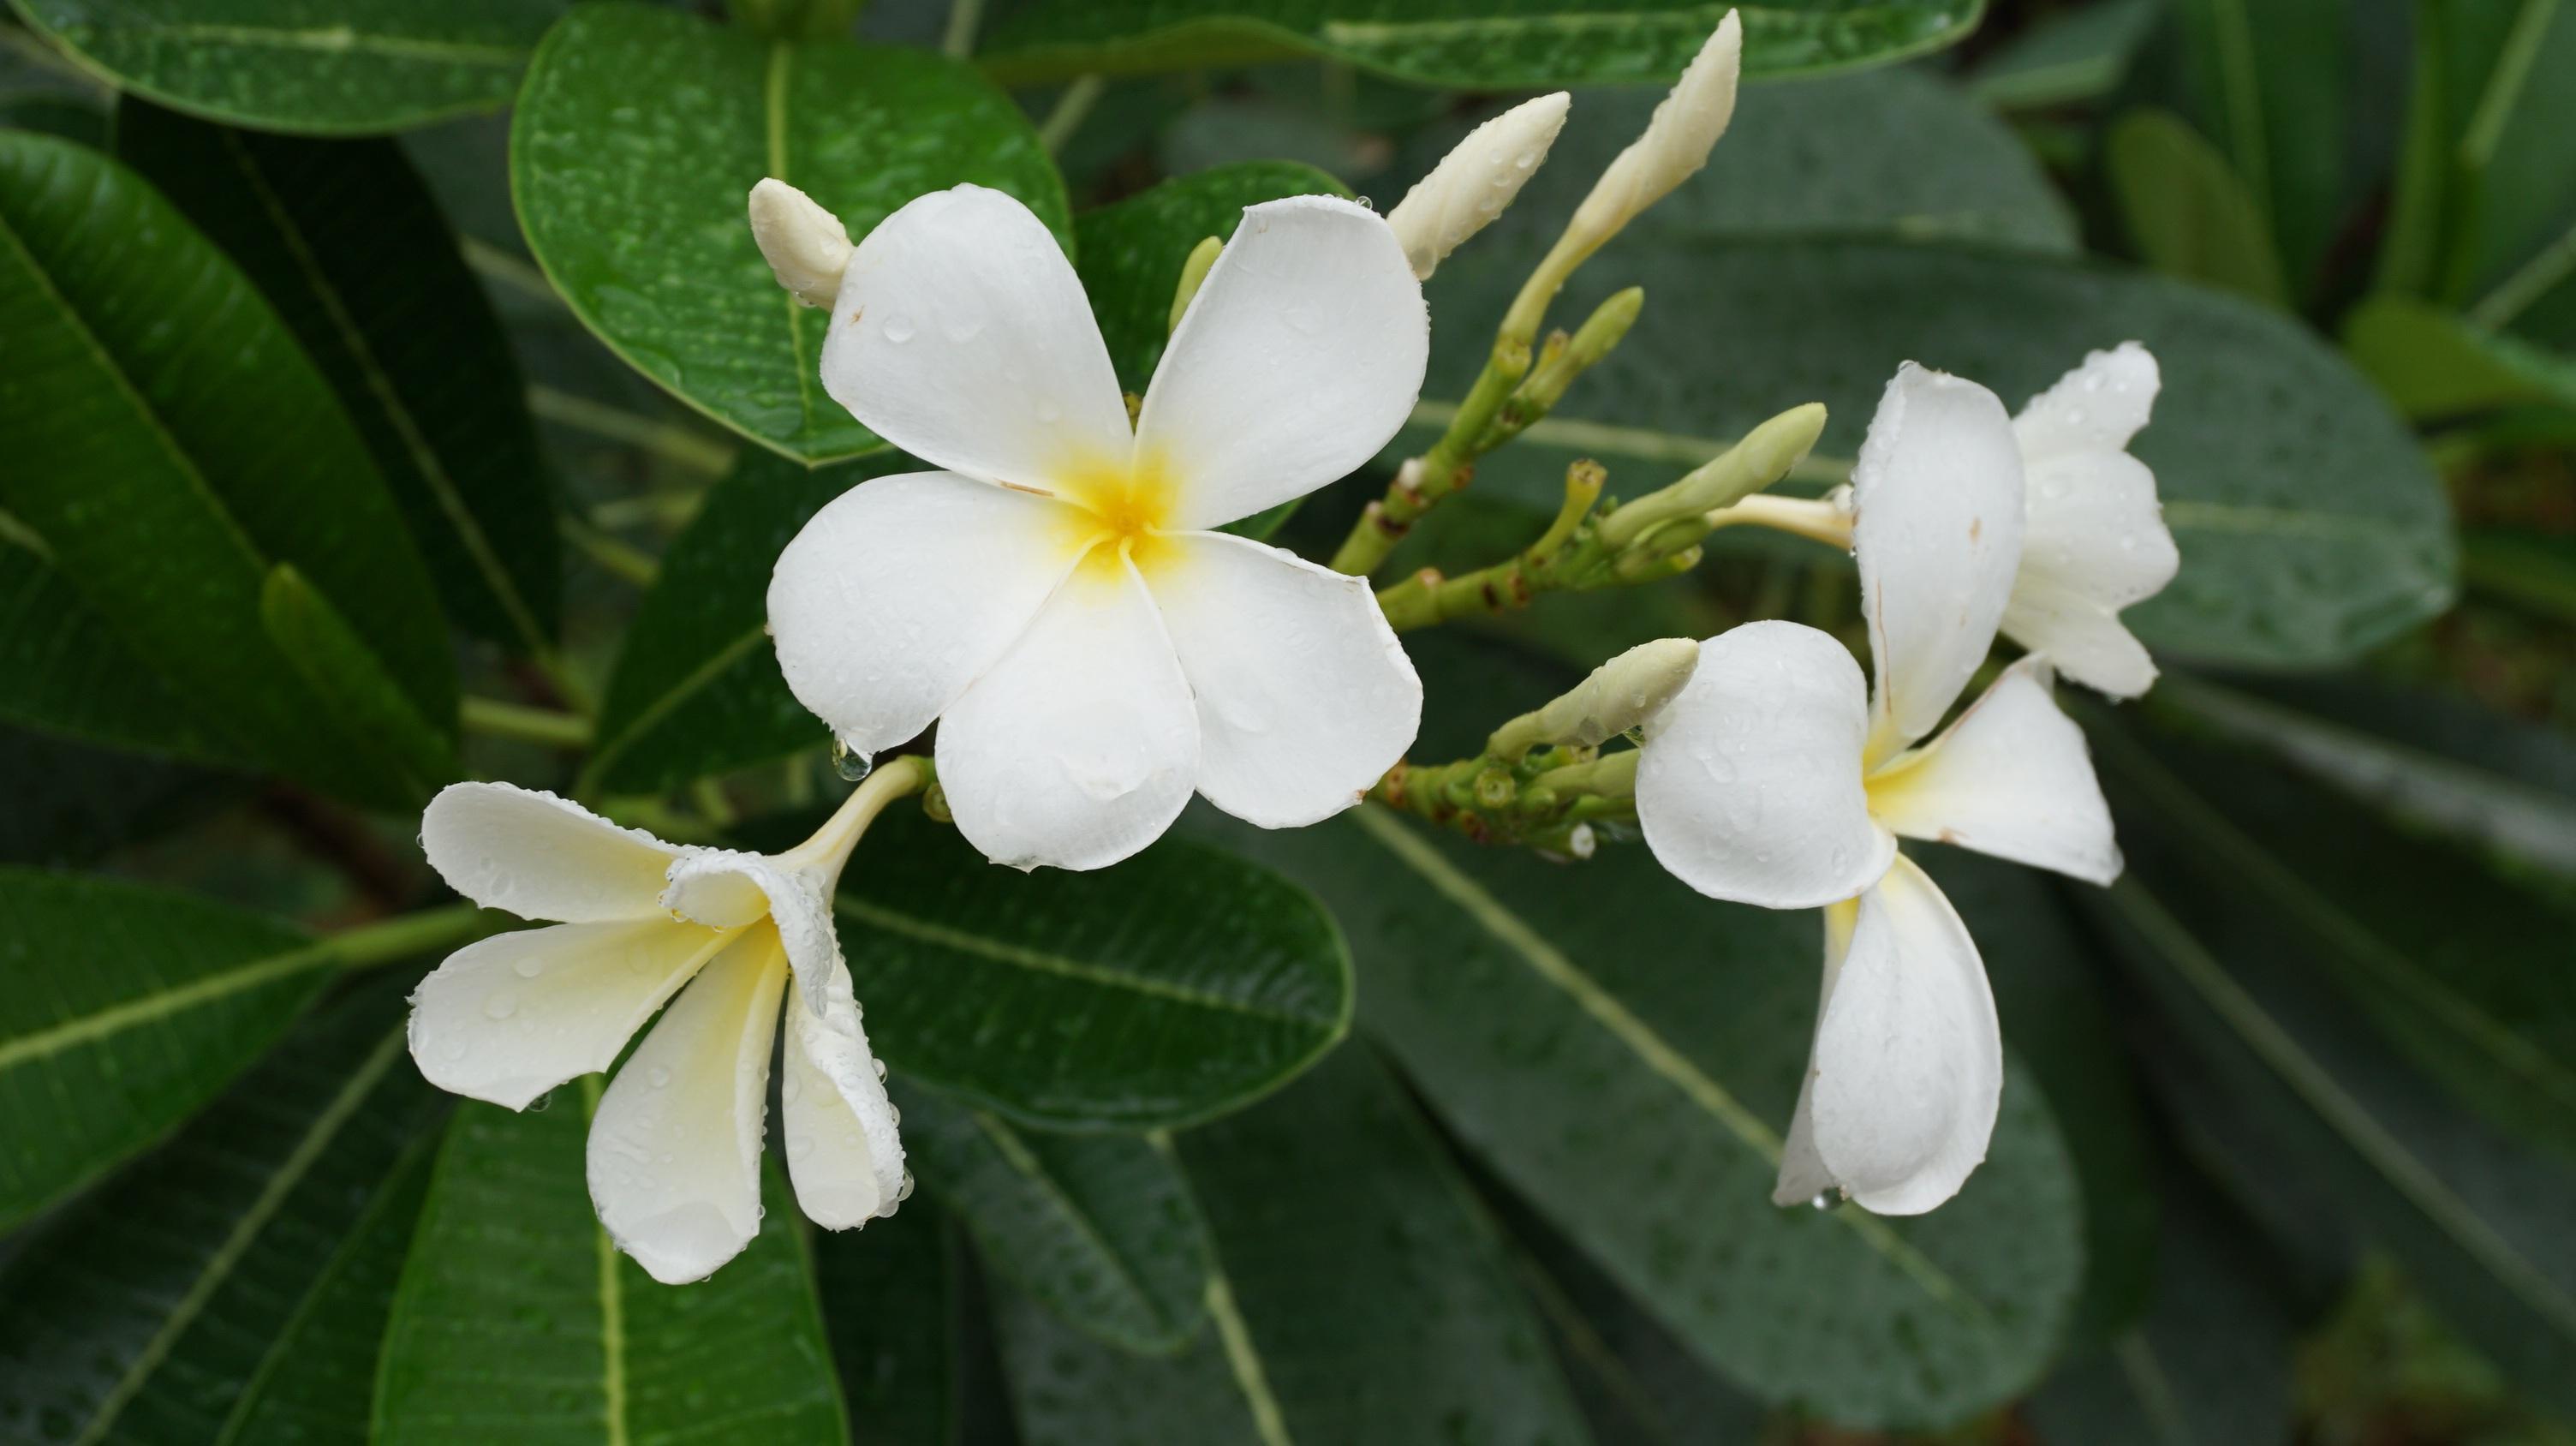 Free Images Nature Blossom Open Flower Petal Botany Flora